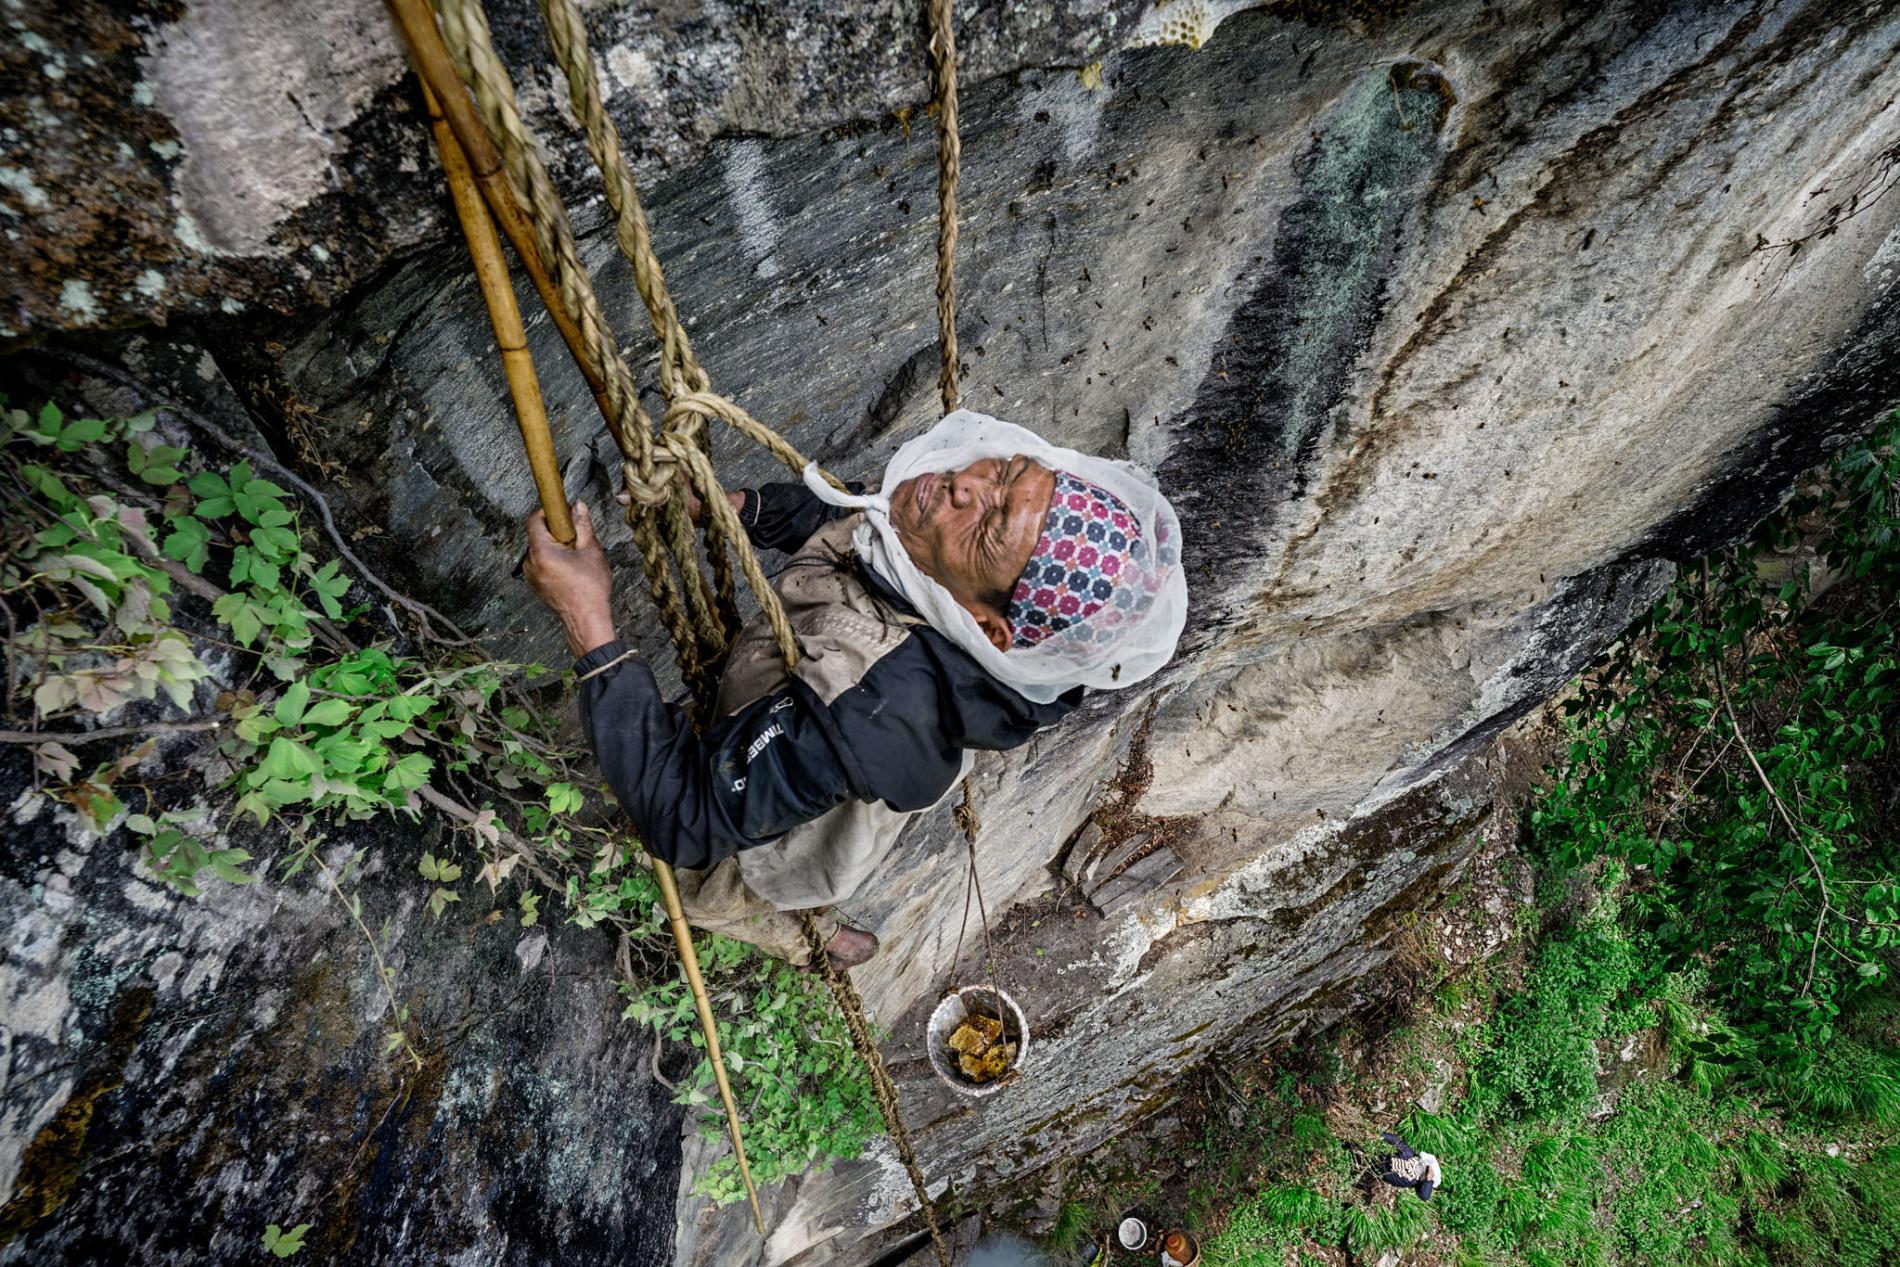 Łowcy miodu z Kulung (fot. Renan Ozturk / National Geographic)